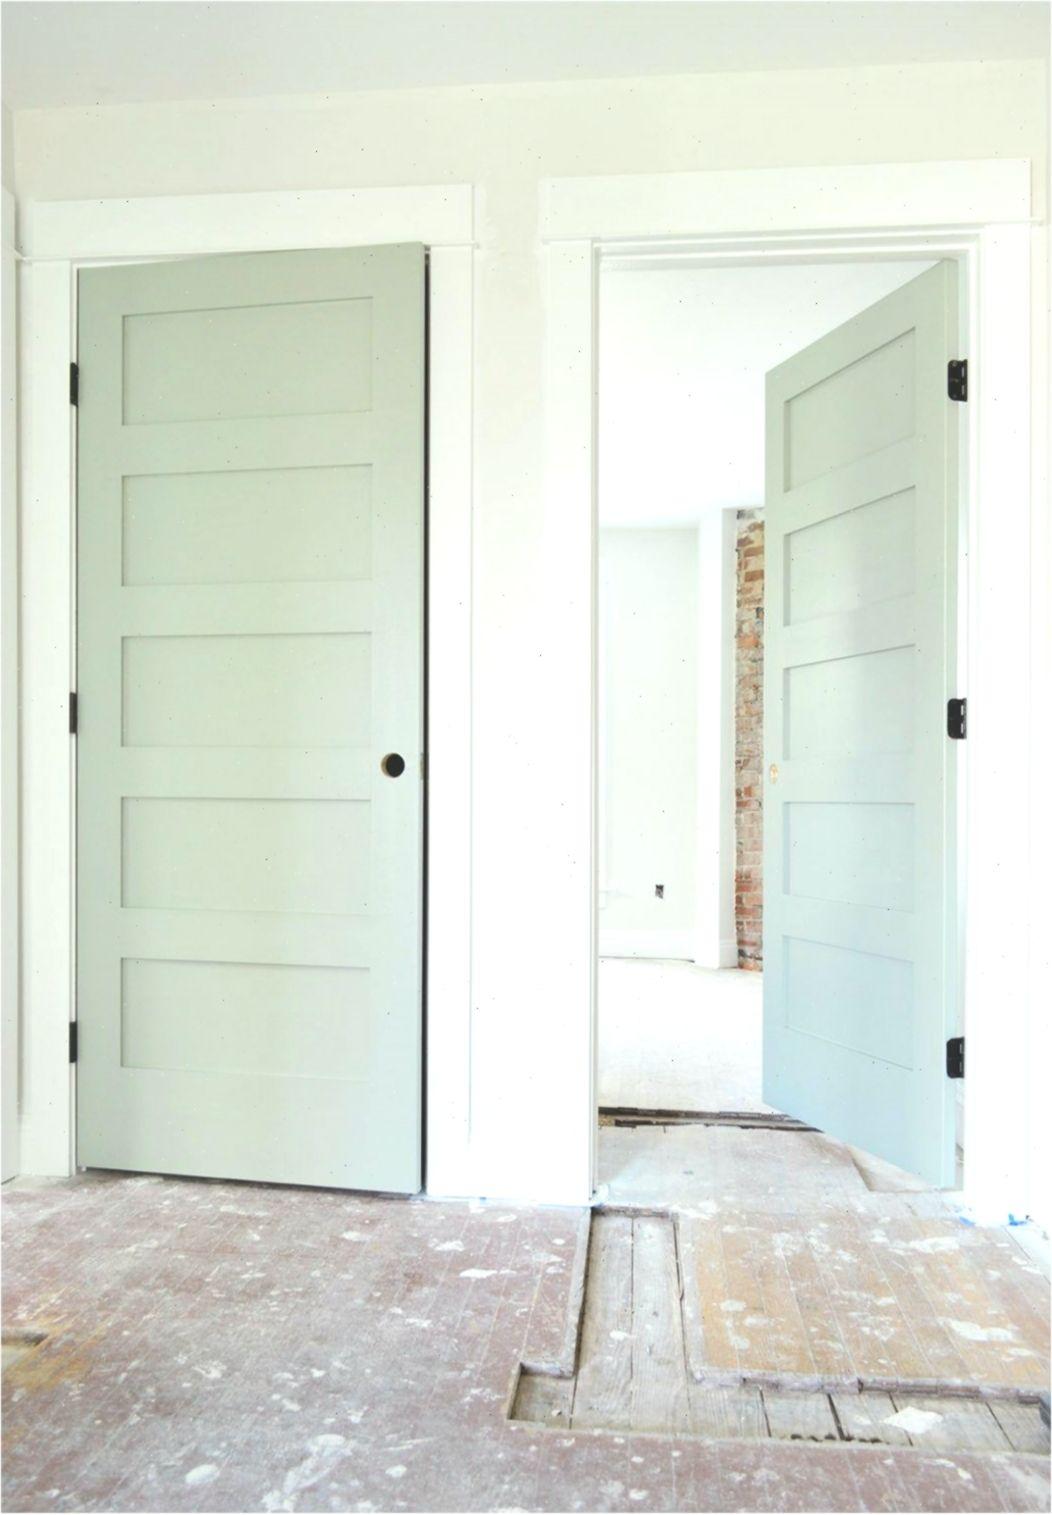 Exciting Developments At The Duplex Interiordoor Developments Door Duplex Exciting Interiordoorideas Doors Interior Doors Wall Trim